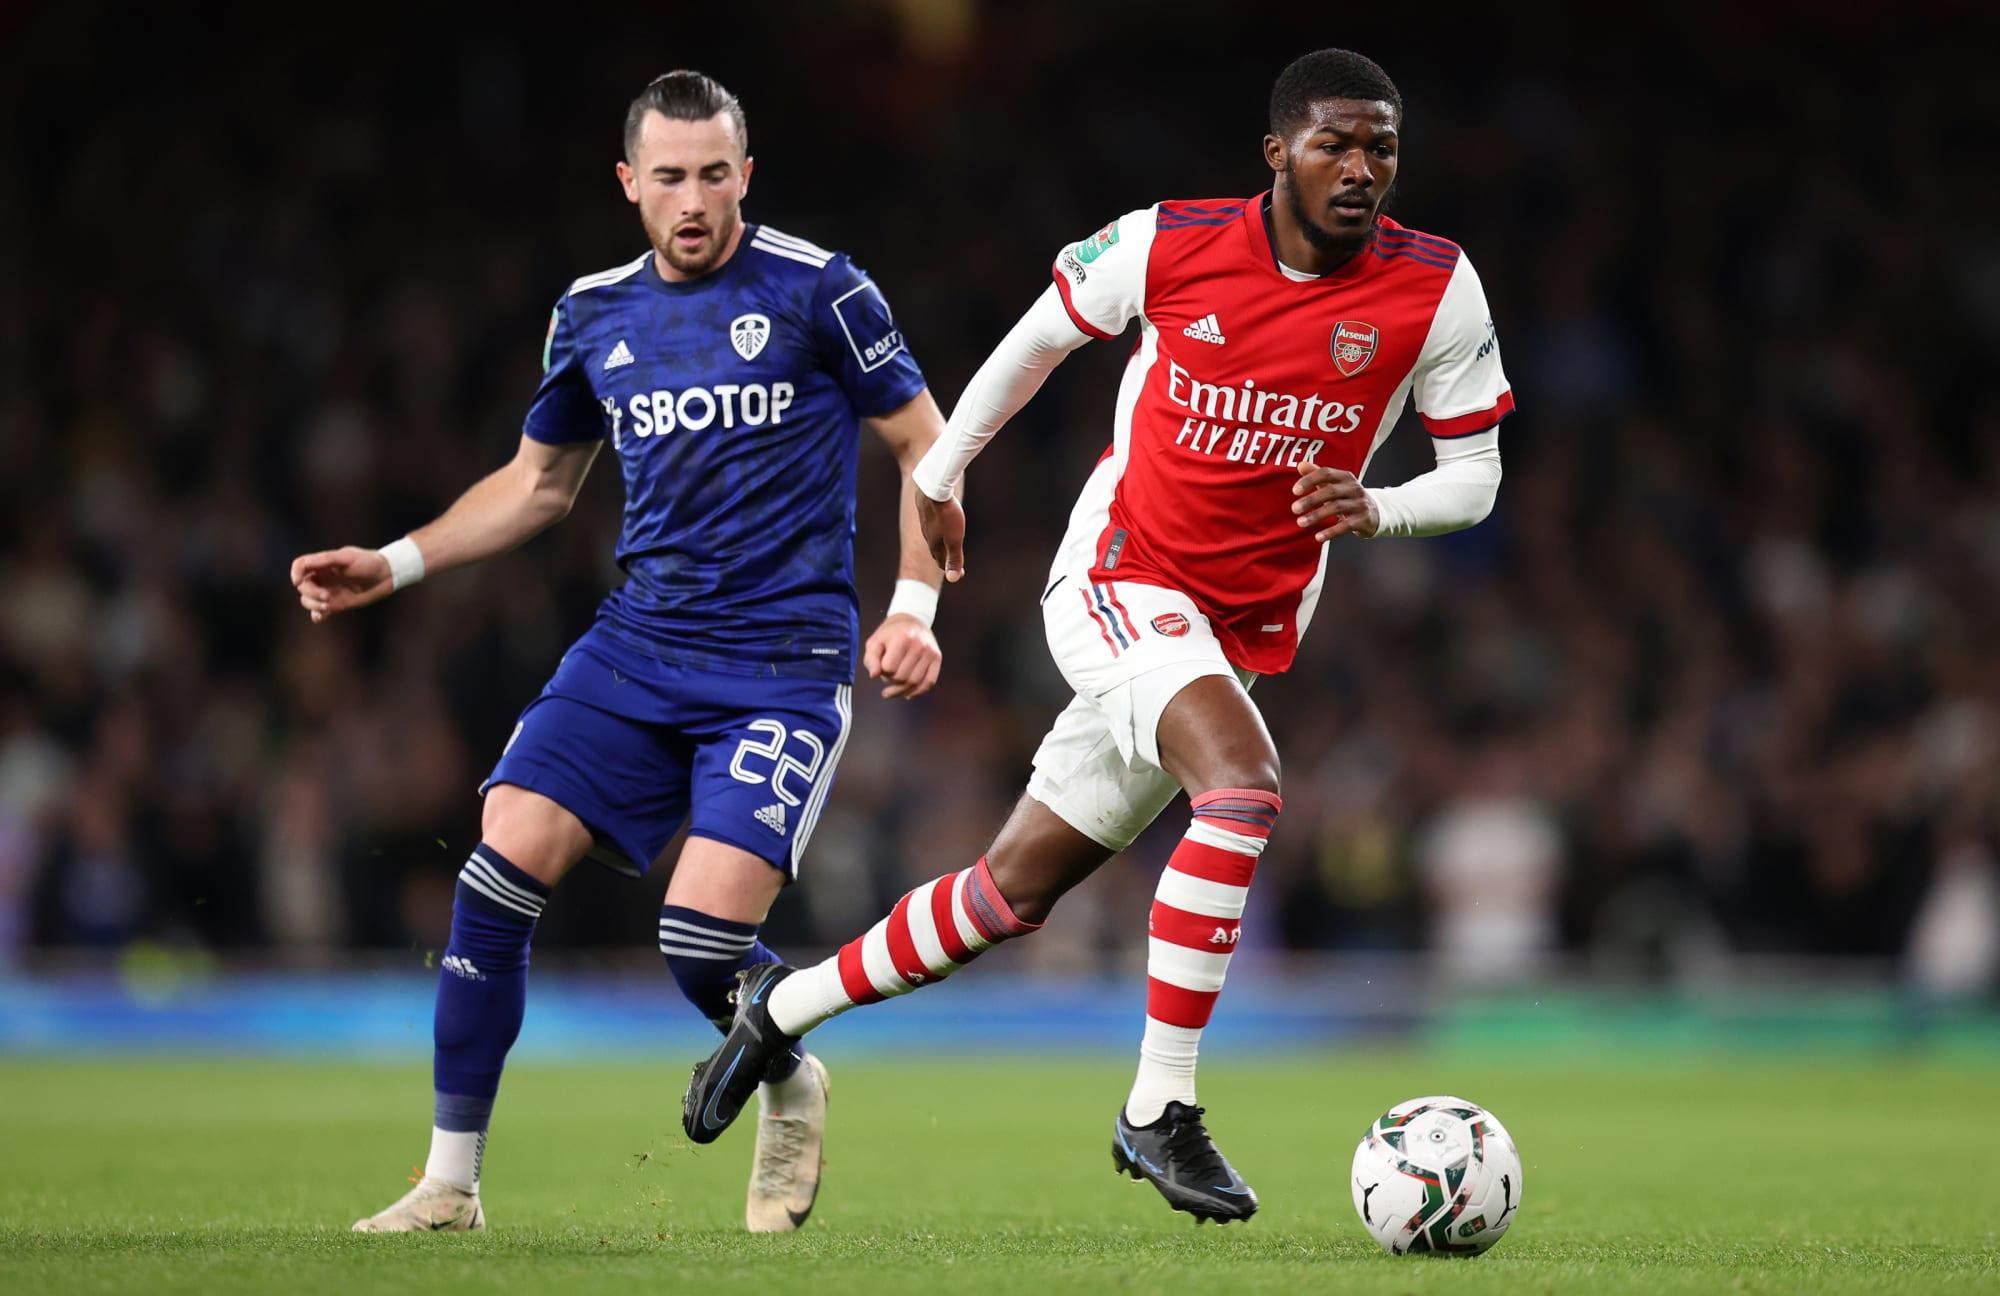 Arsenal: Maitland-Niles takes rare midfield chance